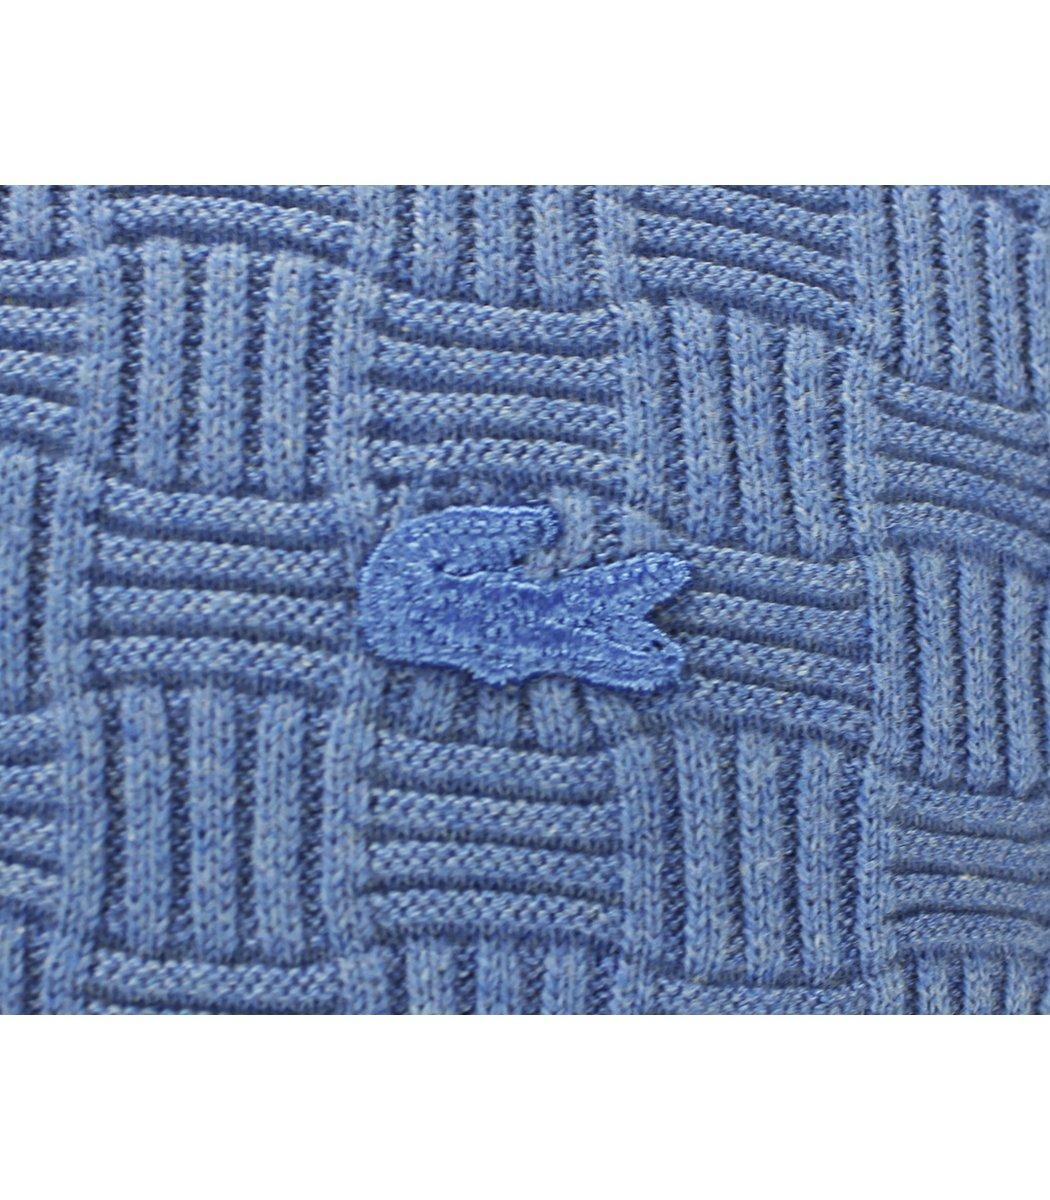 Голубой джемпер Lacoste с узором  JLN